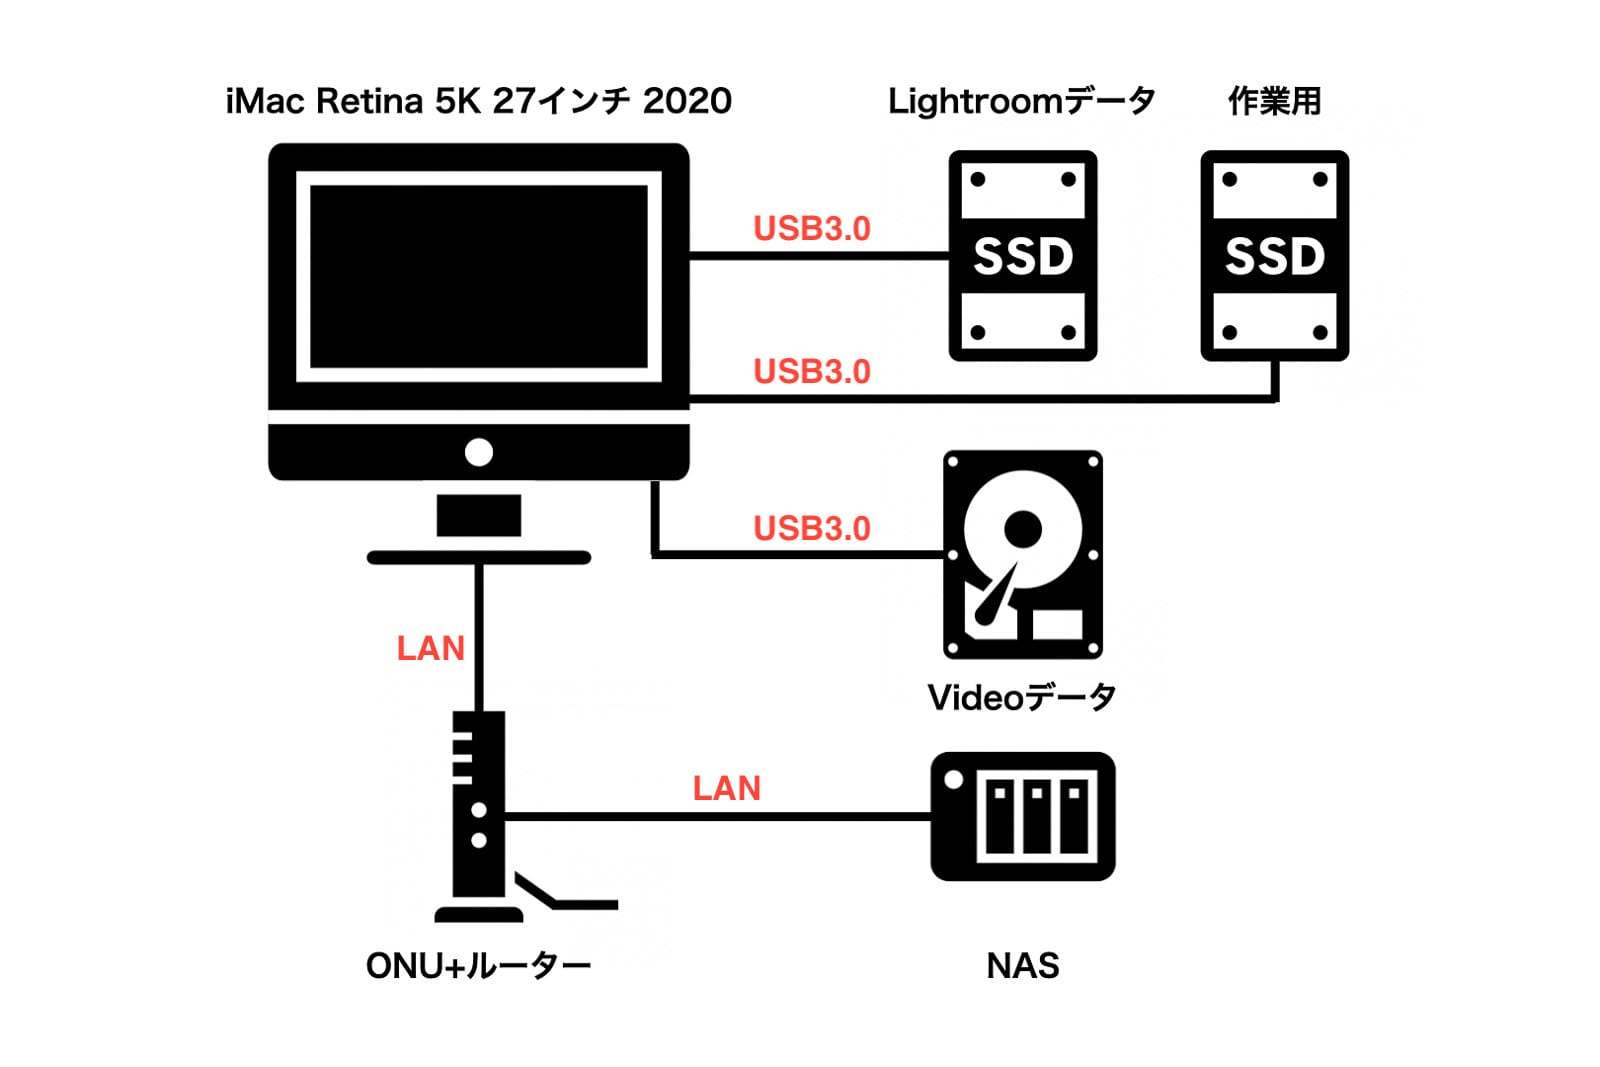 Lightroom カタログ移行 iMac